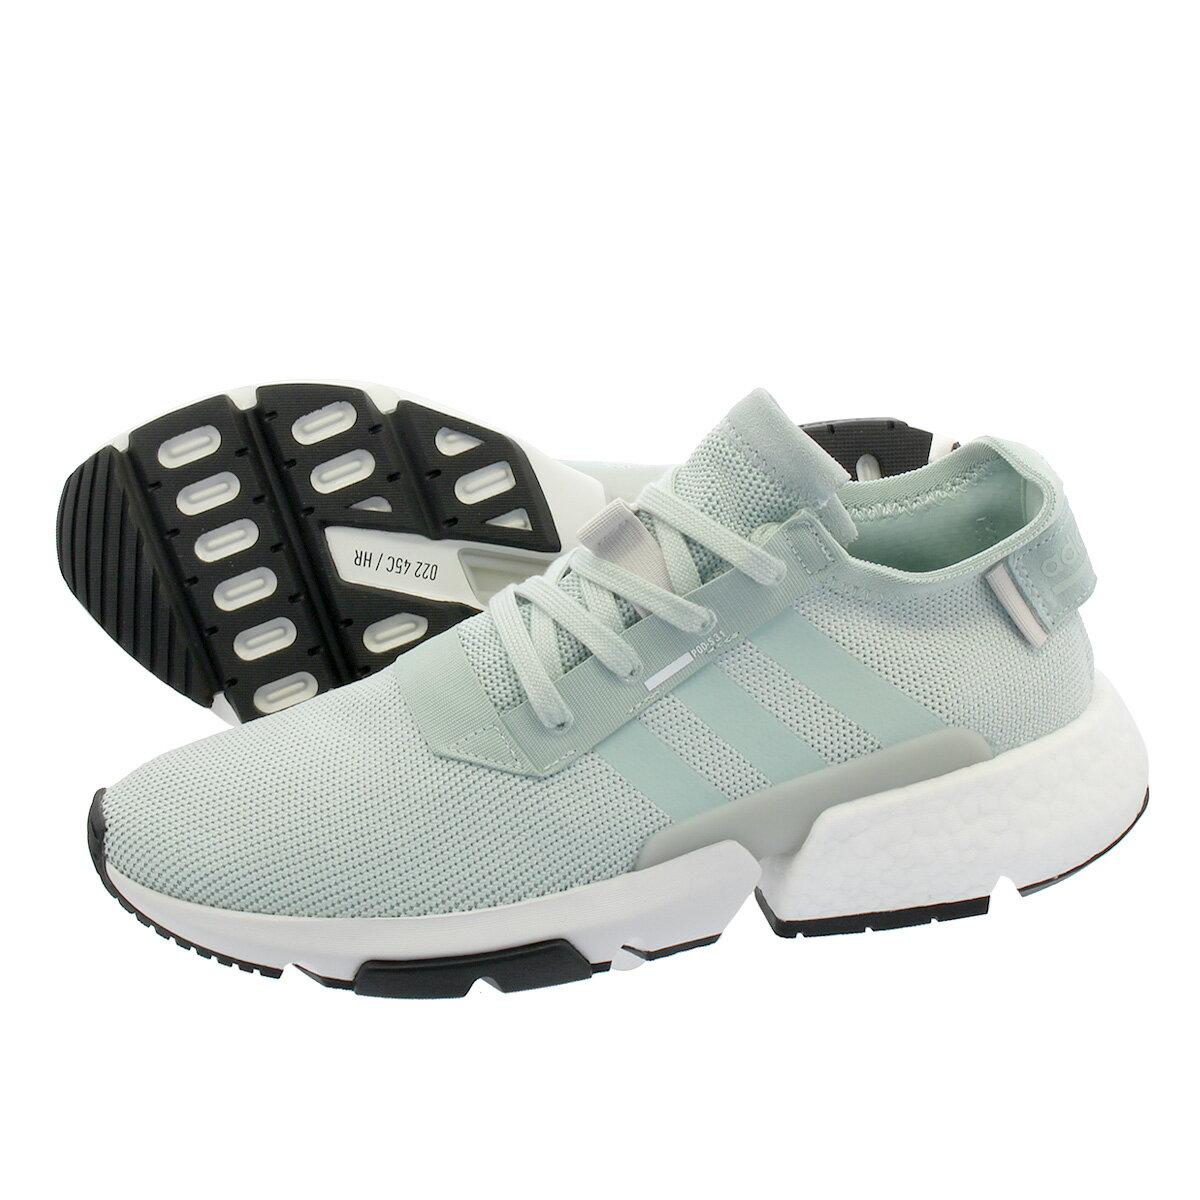 Details about New adidas Originals POD S3.1 Boost Vapor GreenGrey Men's B37368